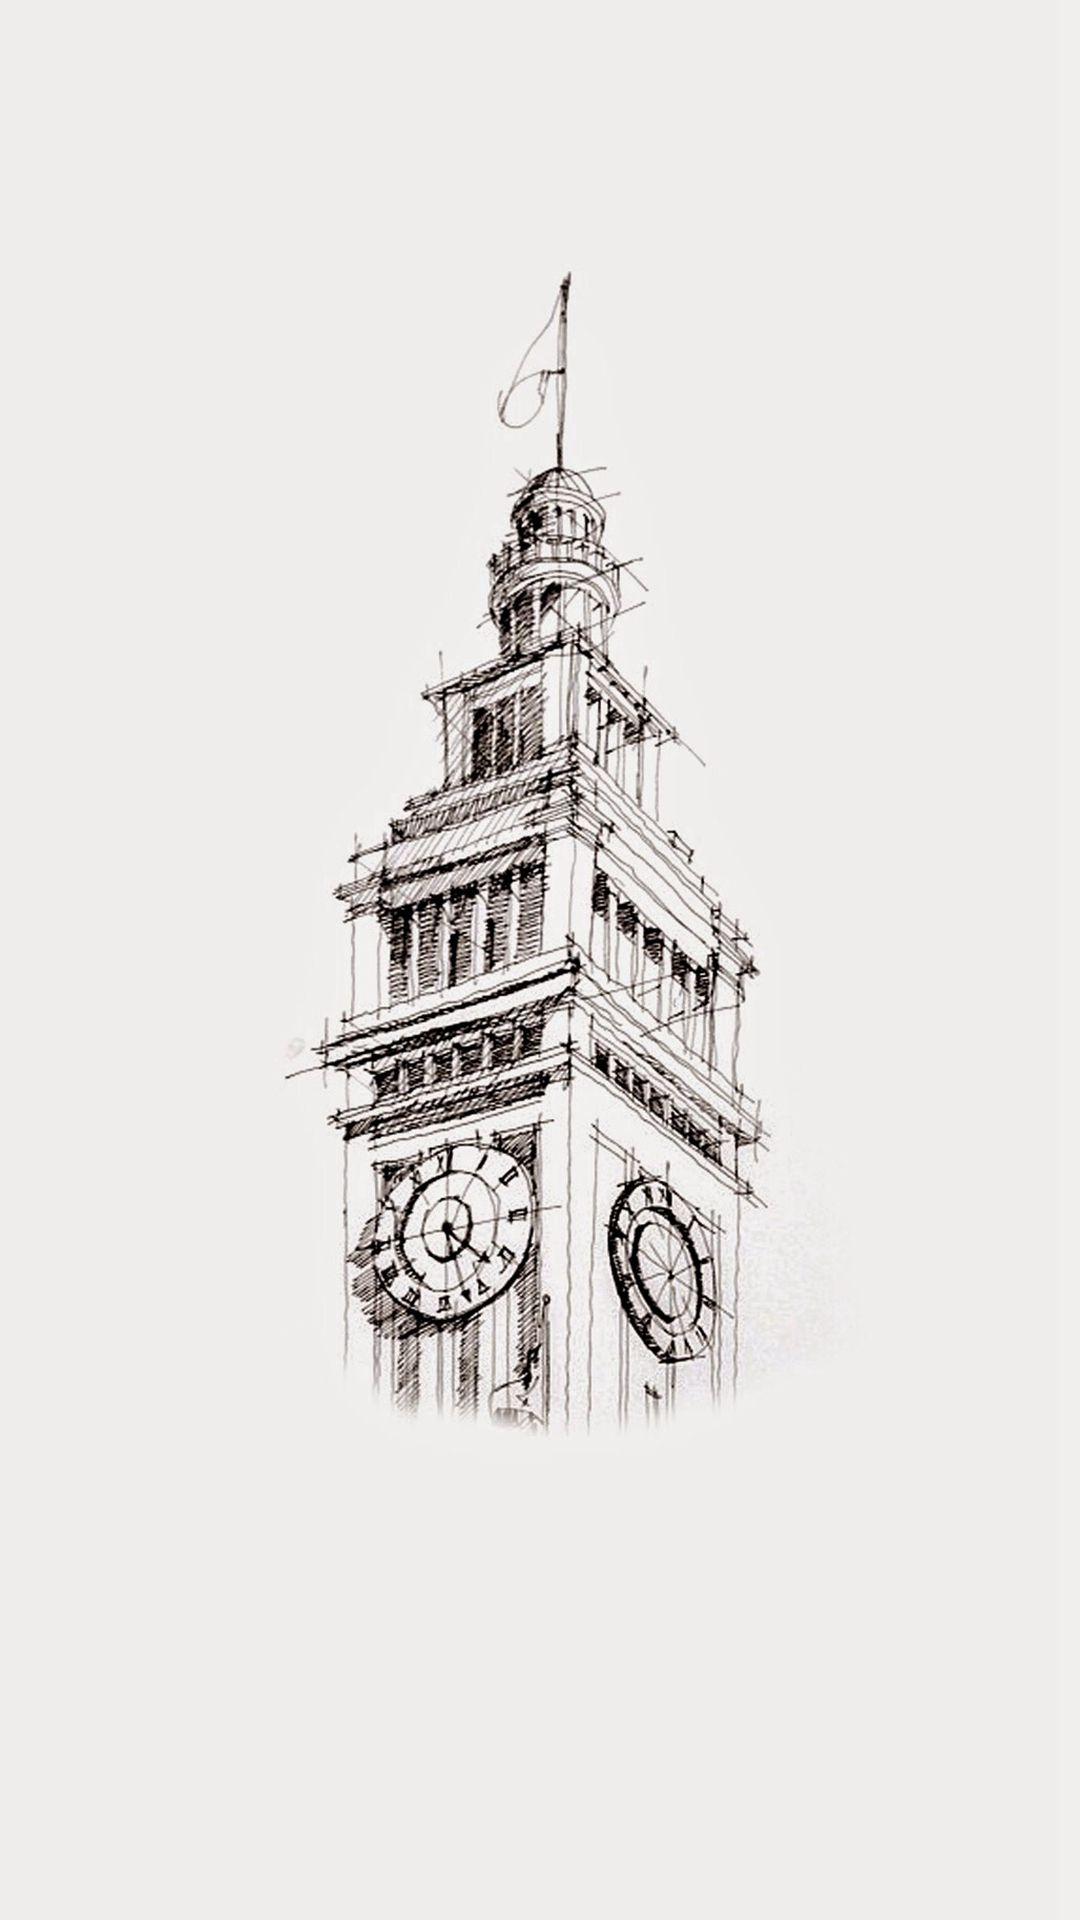 Big Ben Sketch Art Drawn Iphone 6 Plus Wallpaper